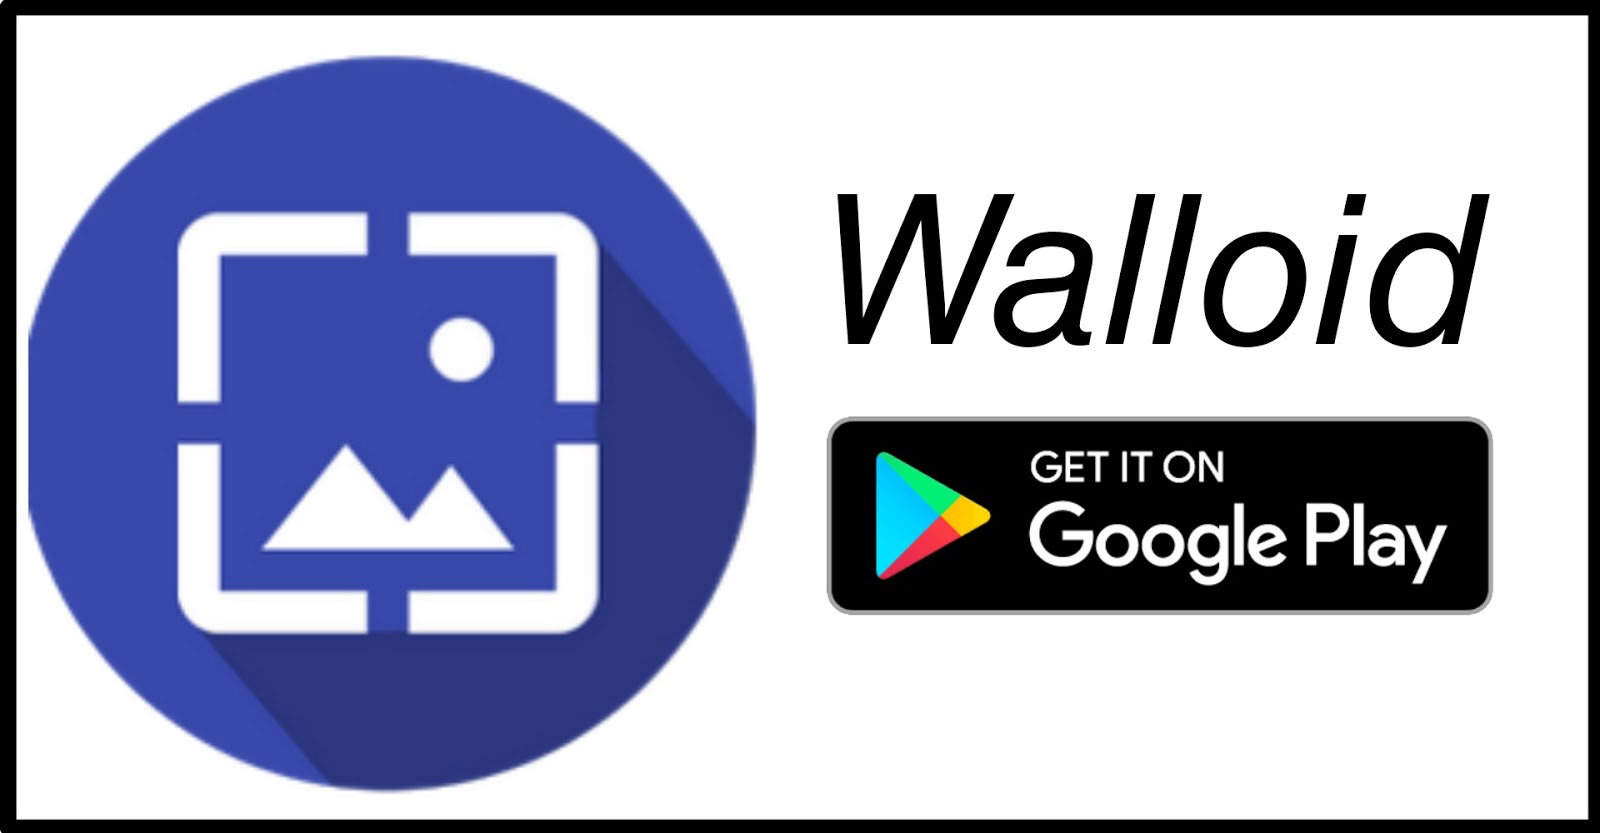 Walloid App